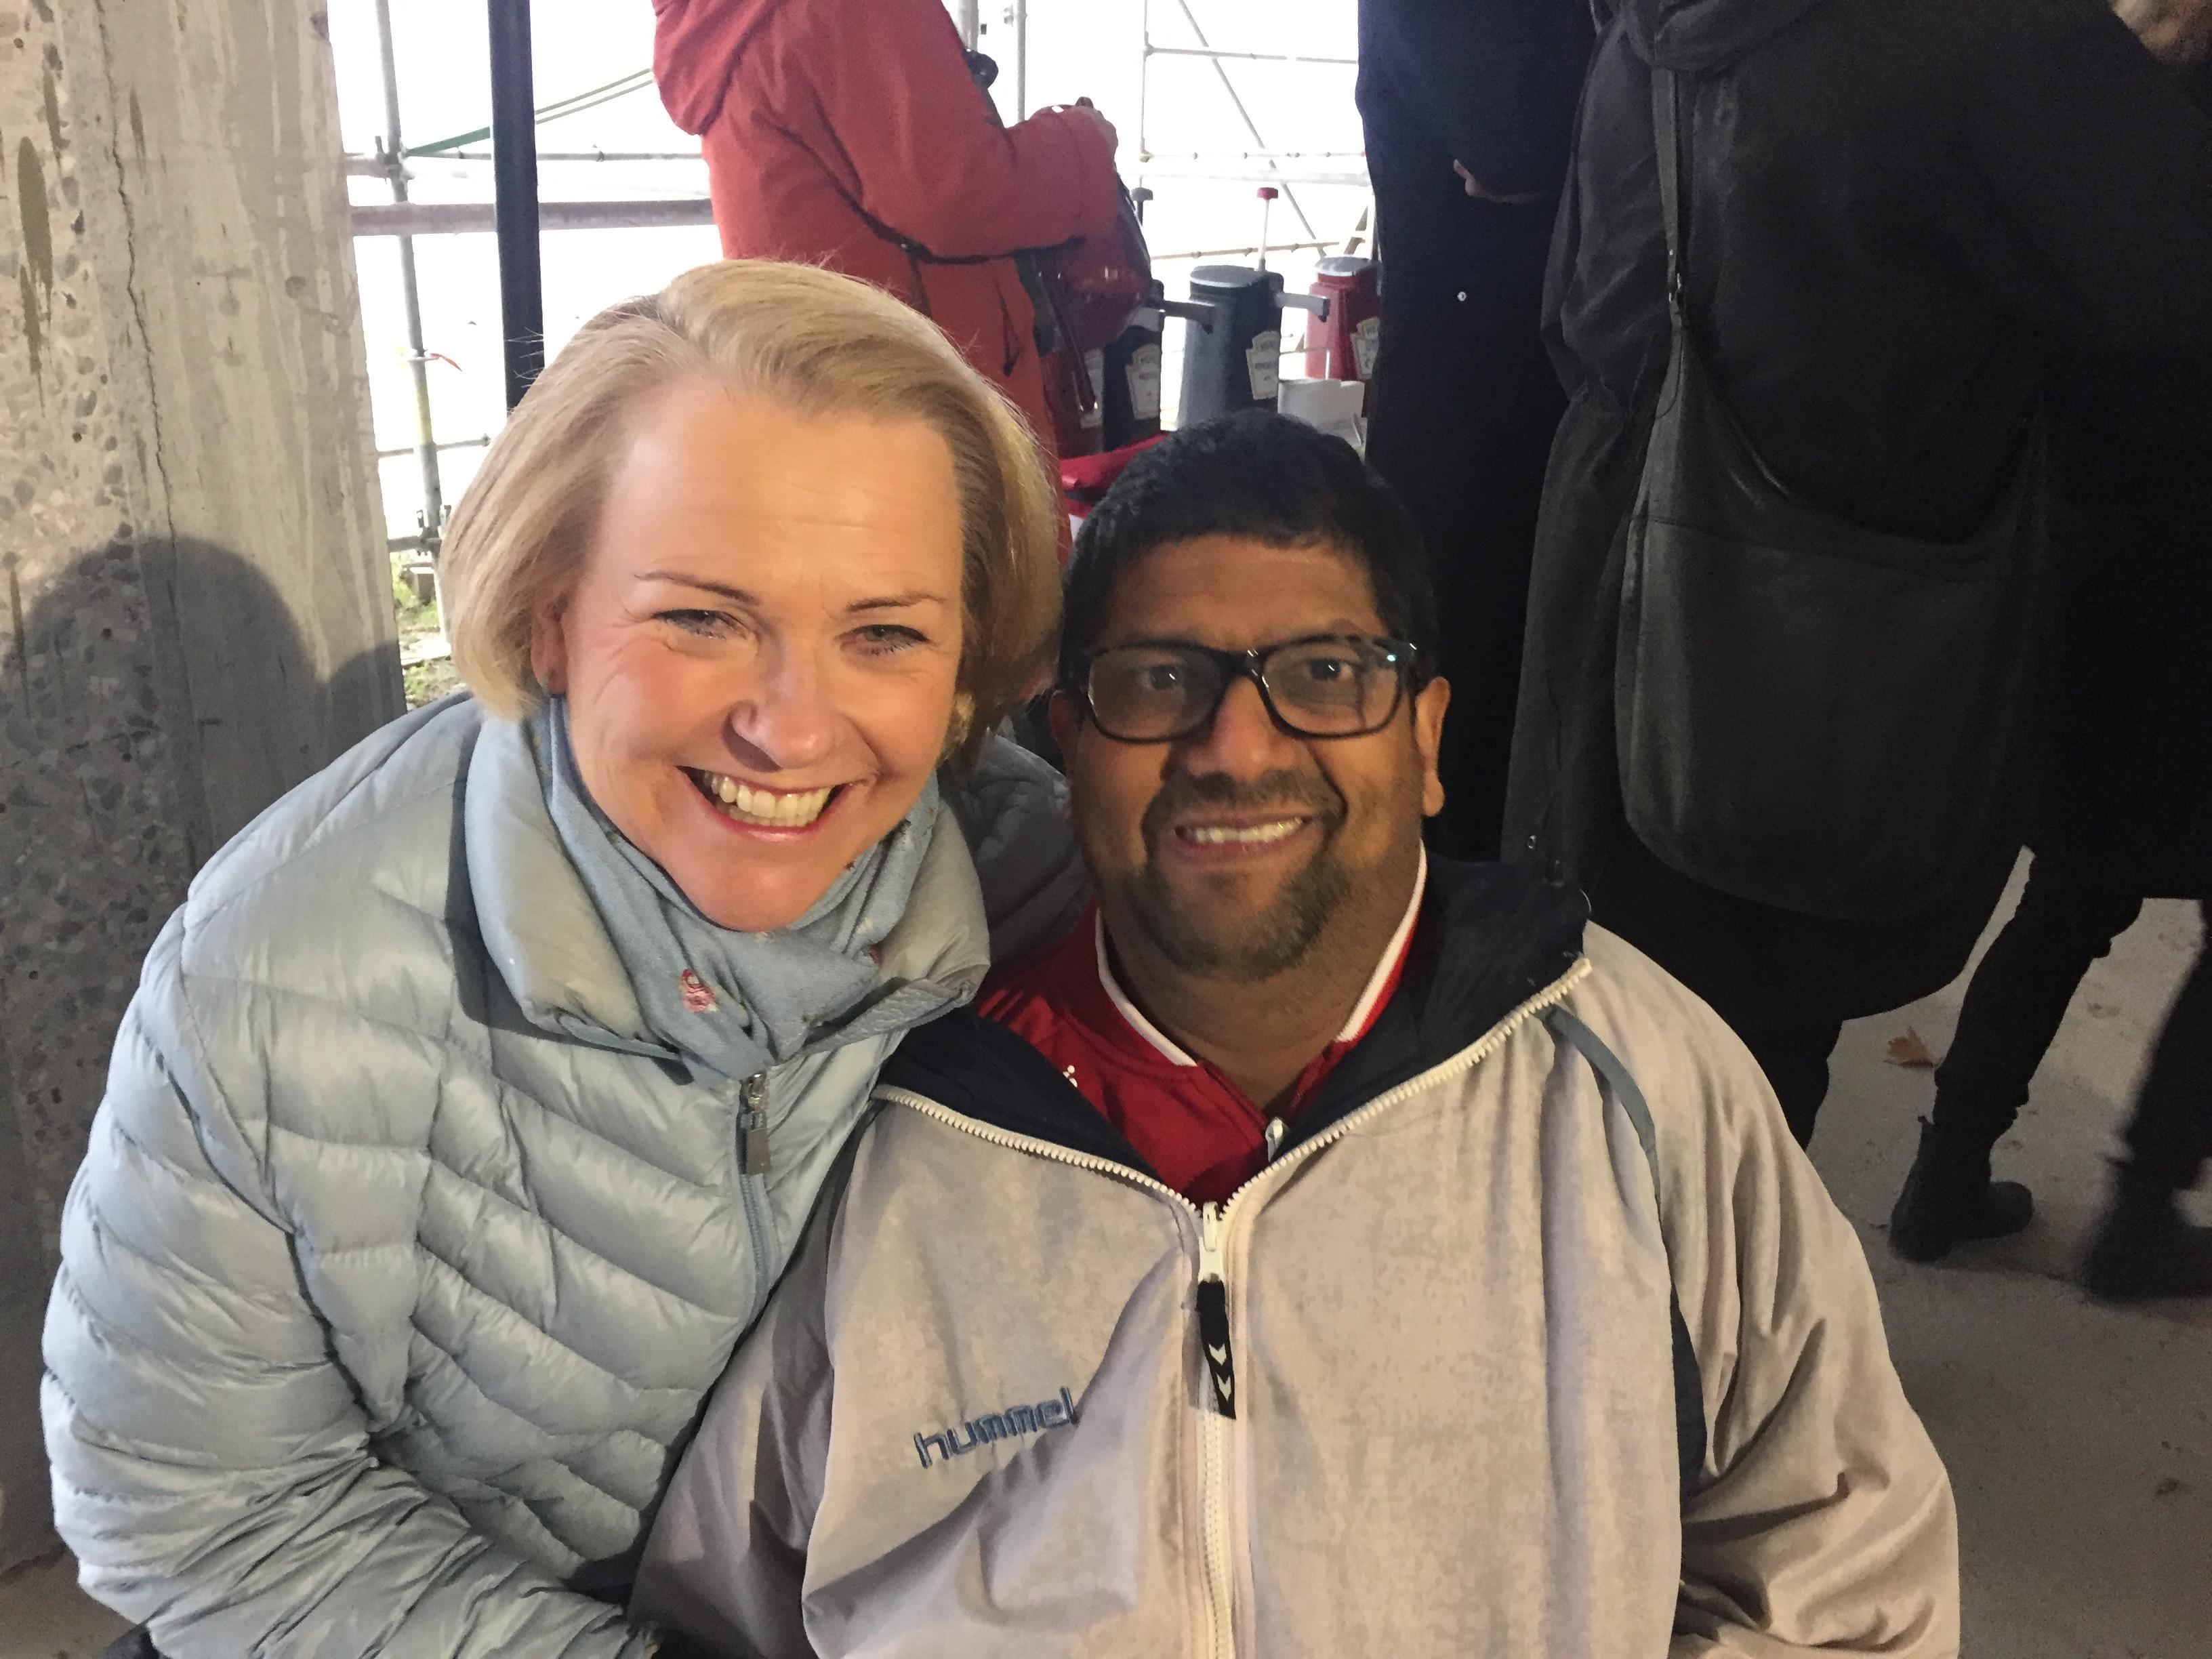 Socialudvalgsformandens tale til rejsegilde, Botilbuddet Betty   Pernille Høxbro